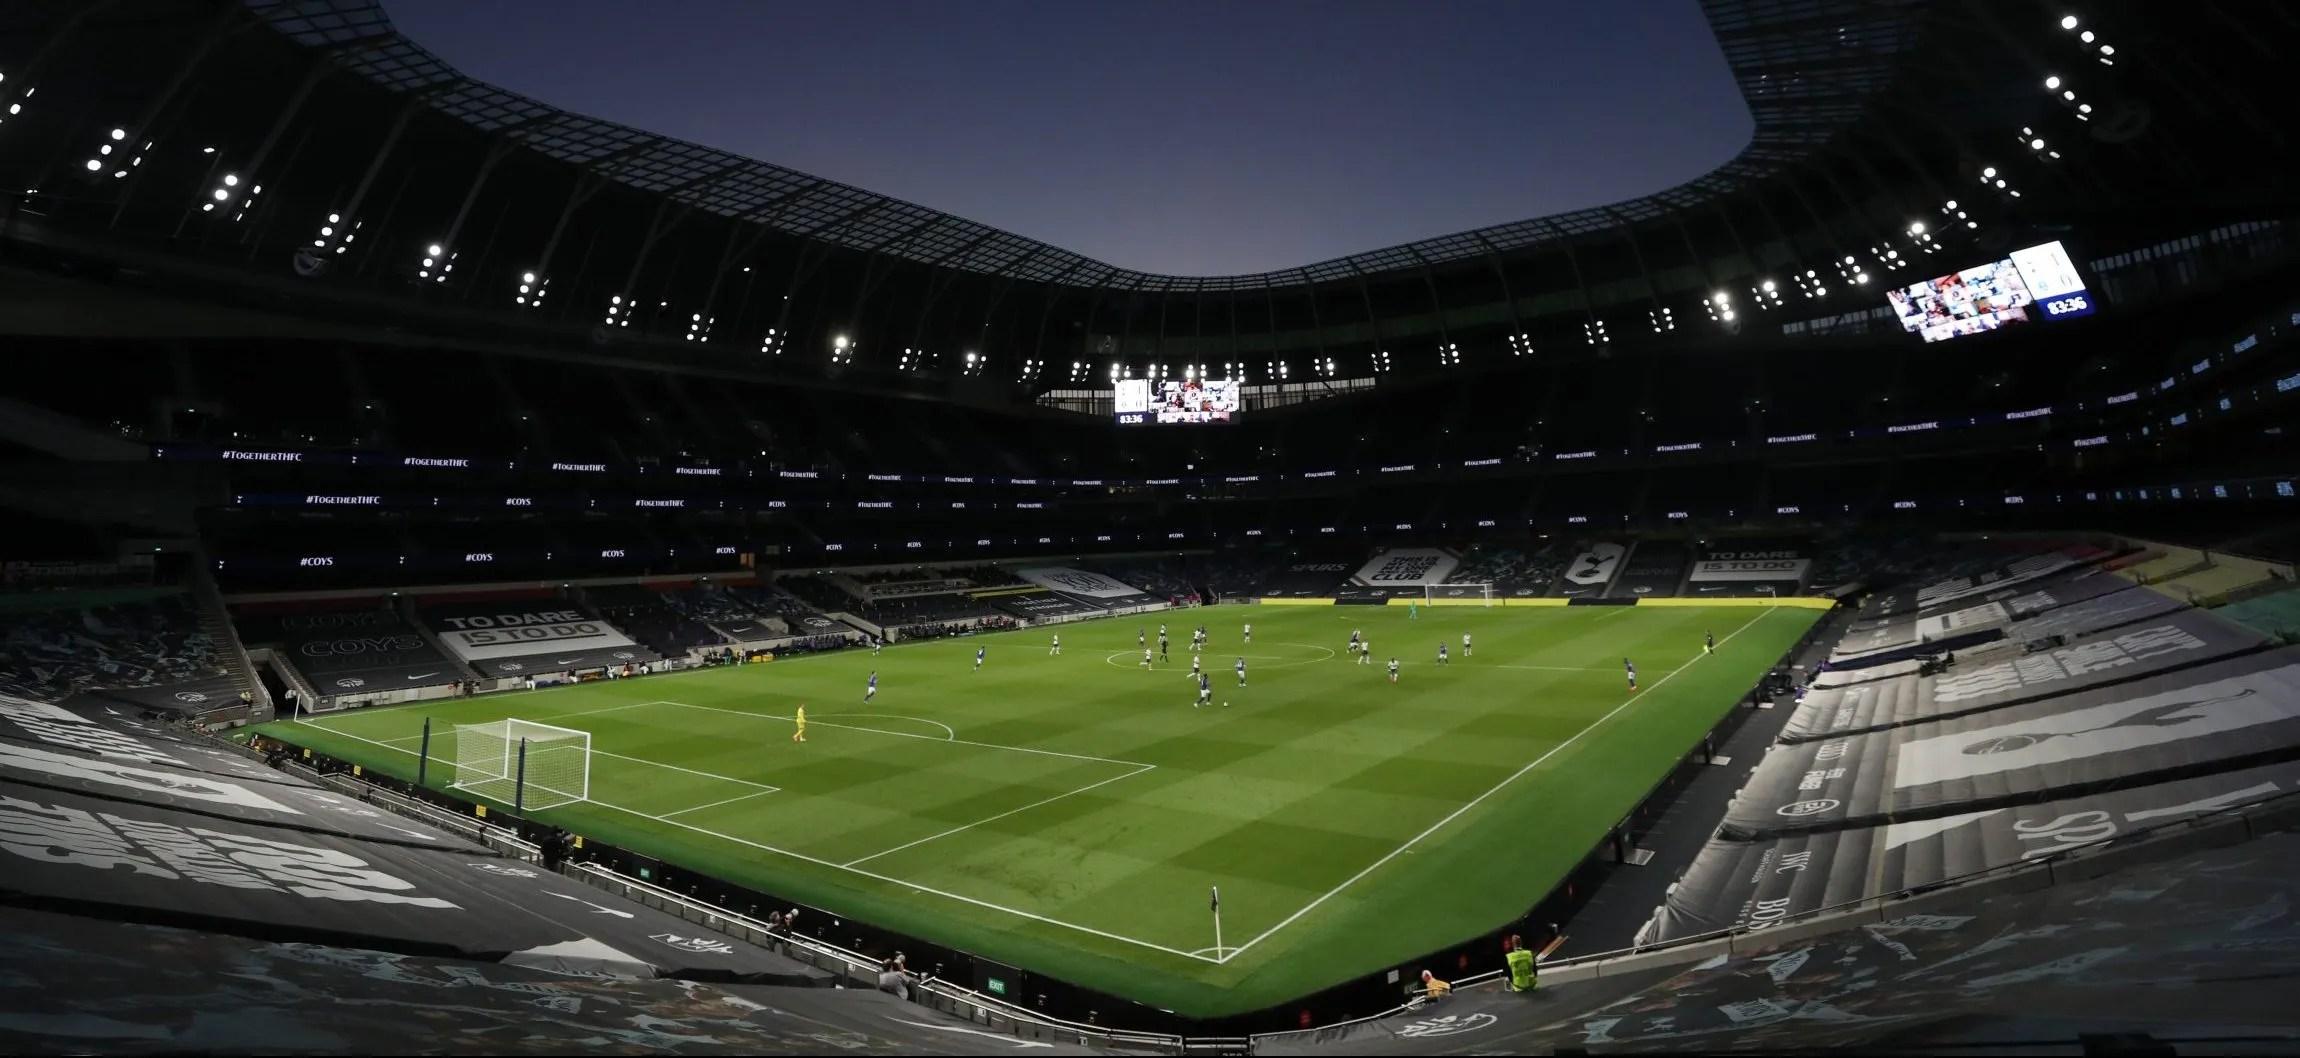 Spurs must beat Chelsea to Kim Min-jae